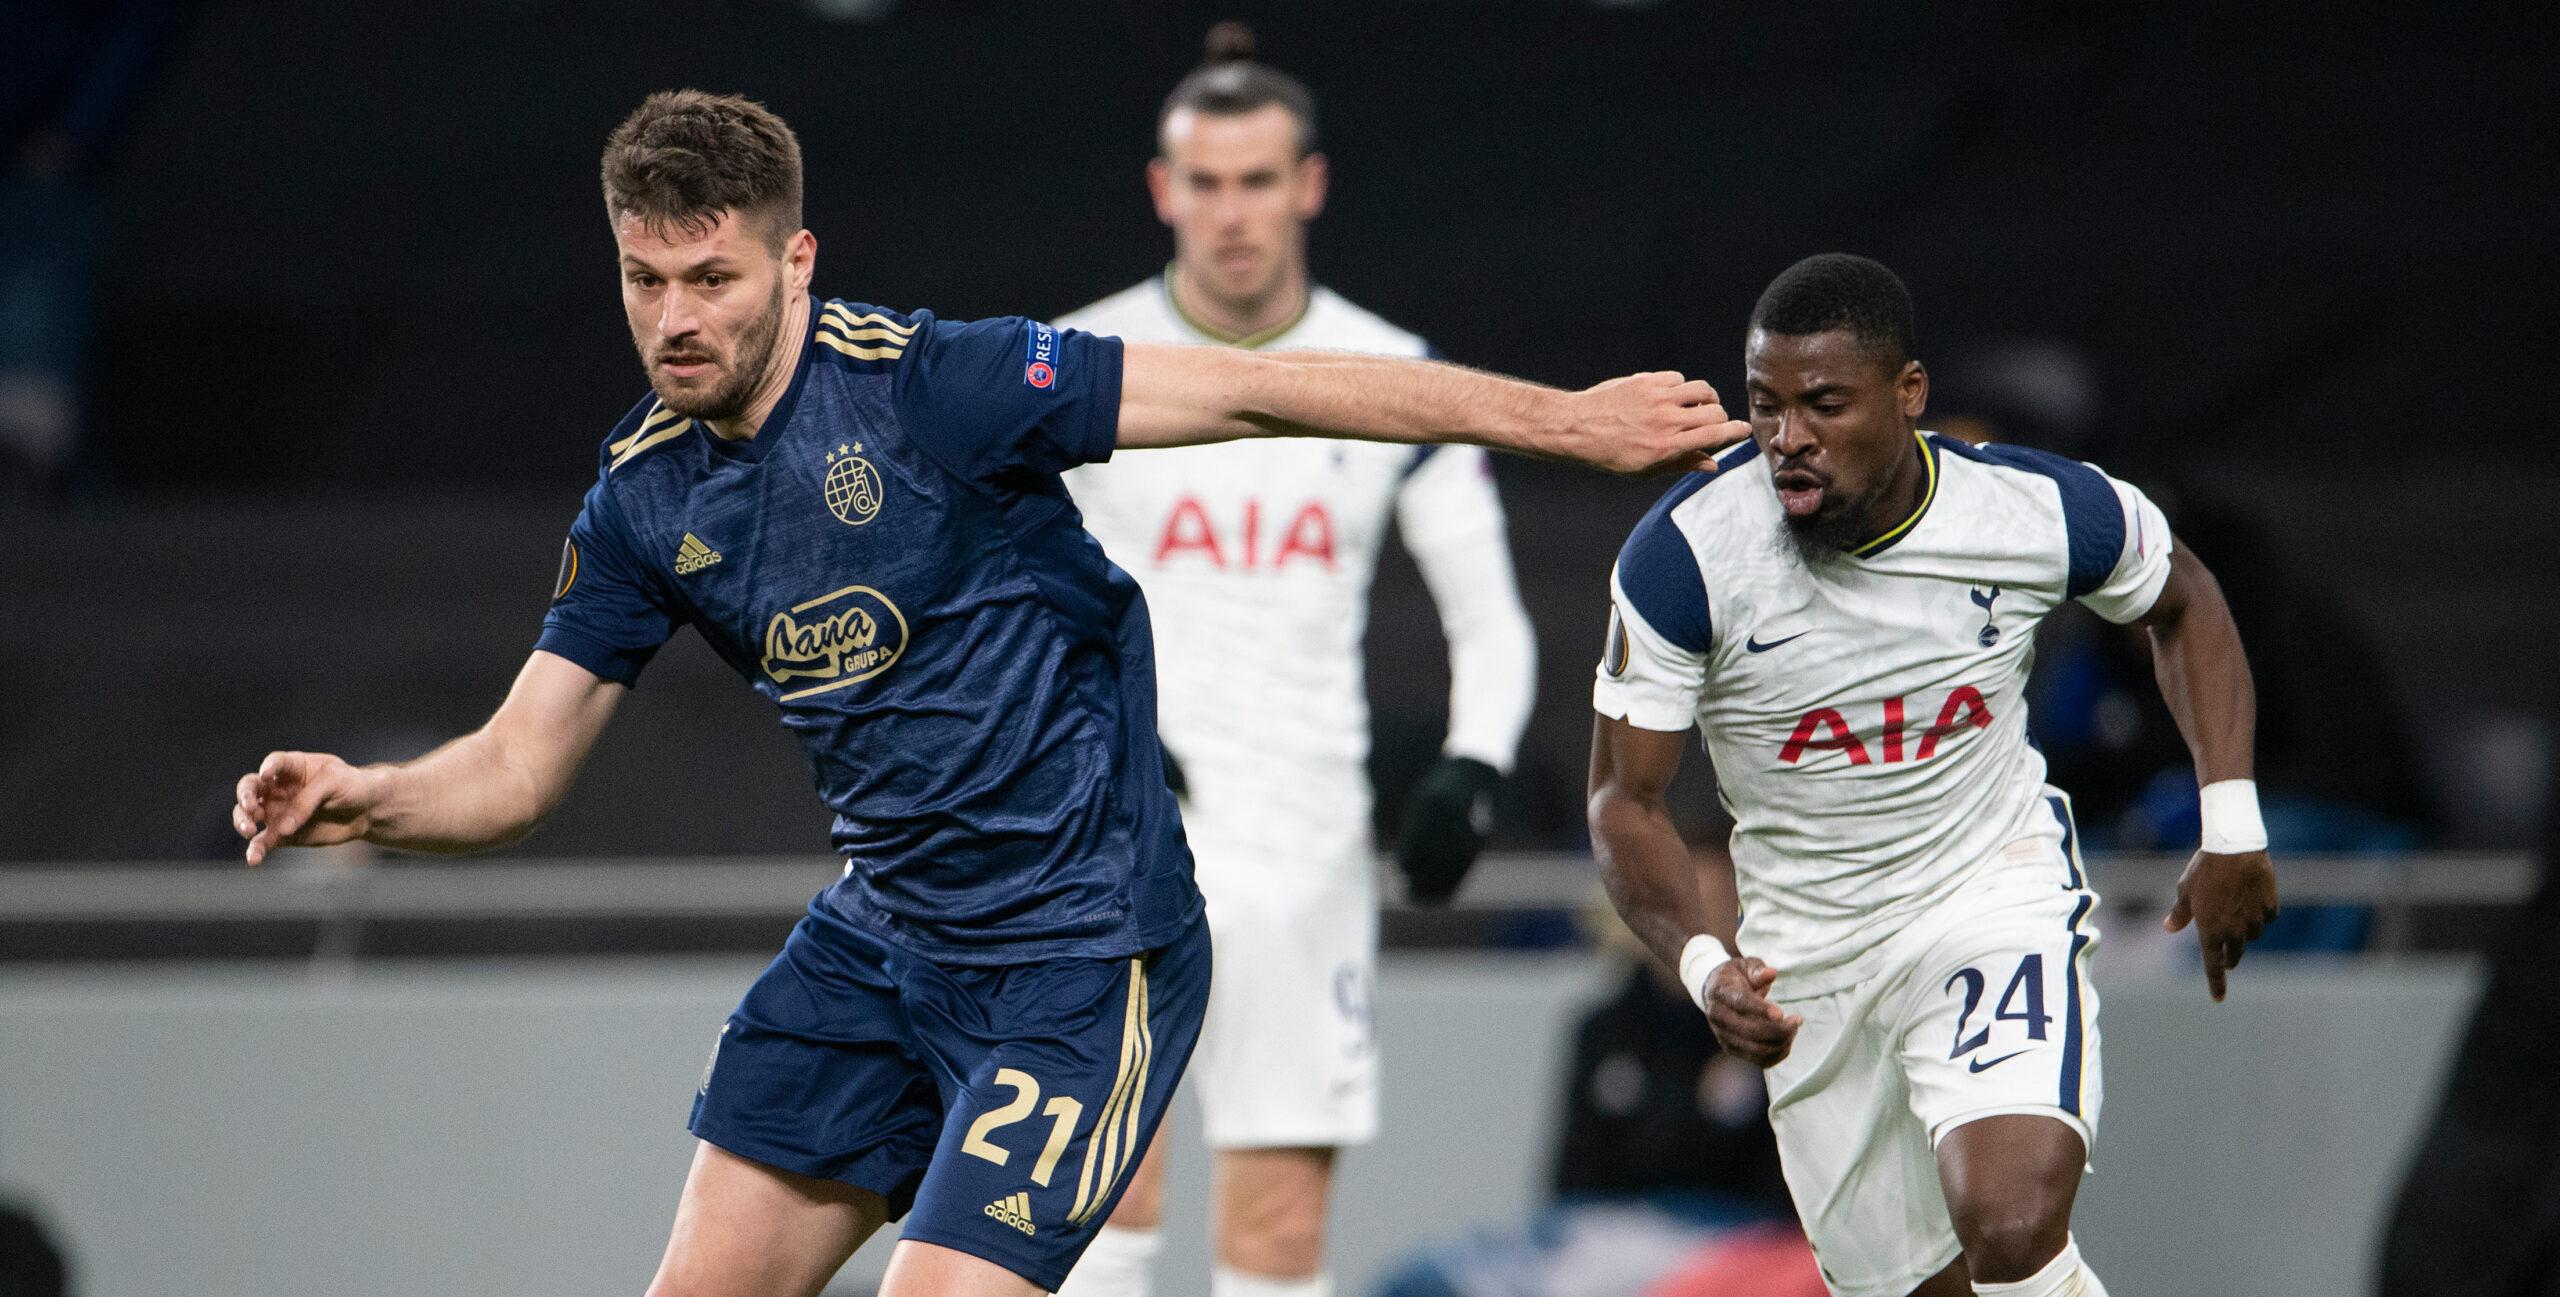 Dinamo Zagreb vs Tottenham: Prediction, Lineups, Team News, Betting Tips & Match Previews